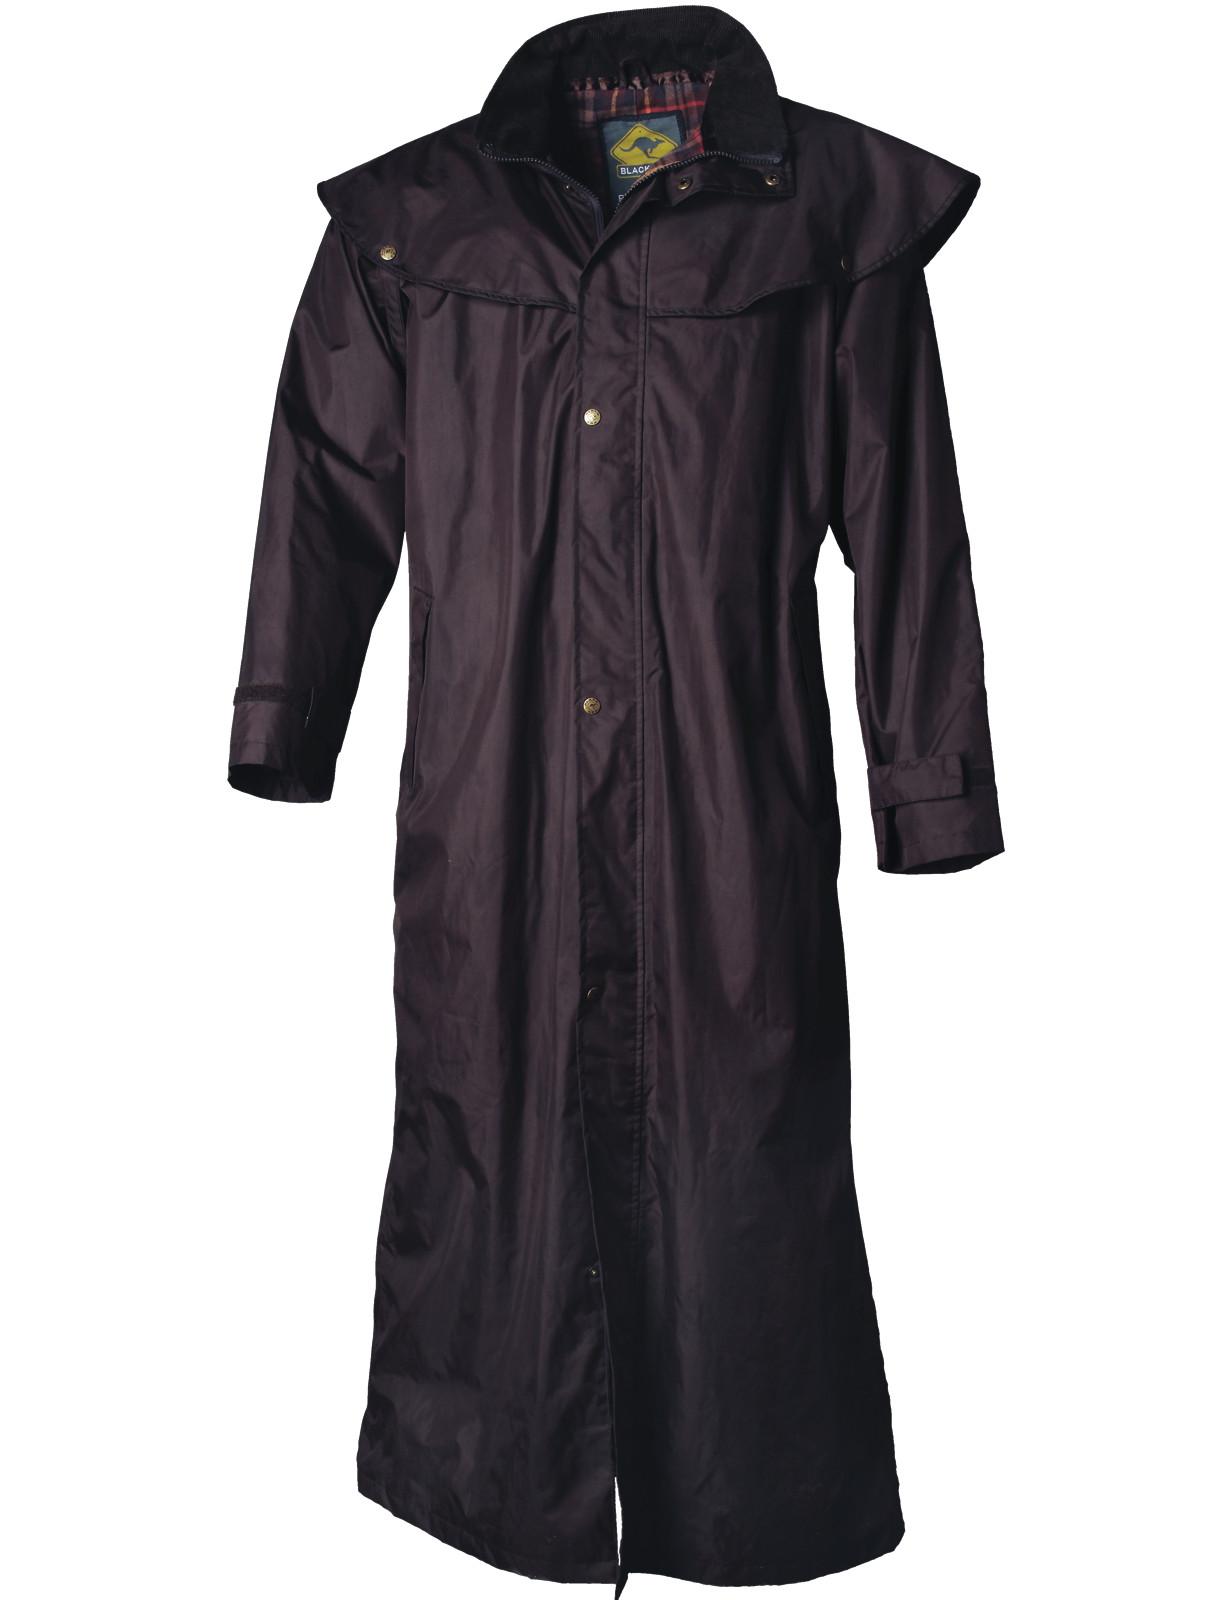 Black Roo »Stockman Coat« Mantel für Cowboys Biker BRAUN